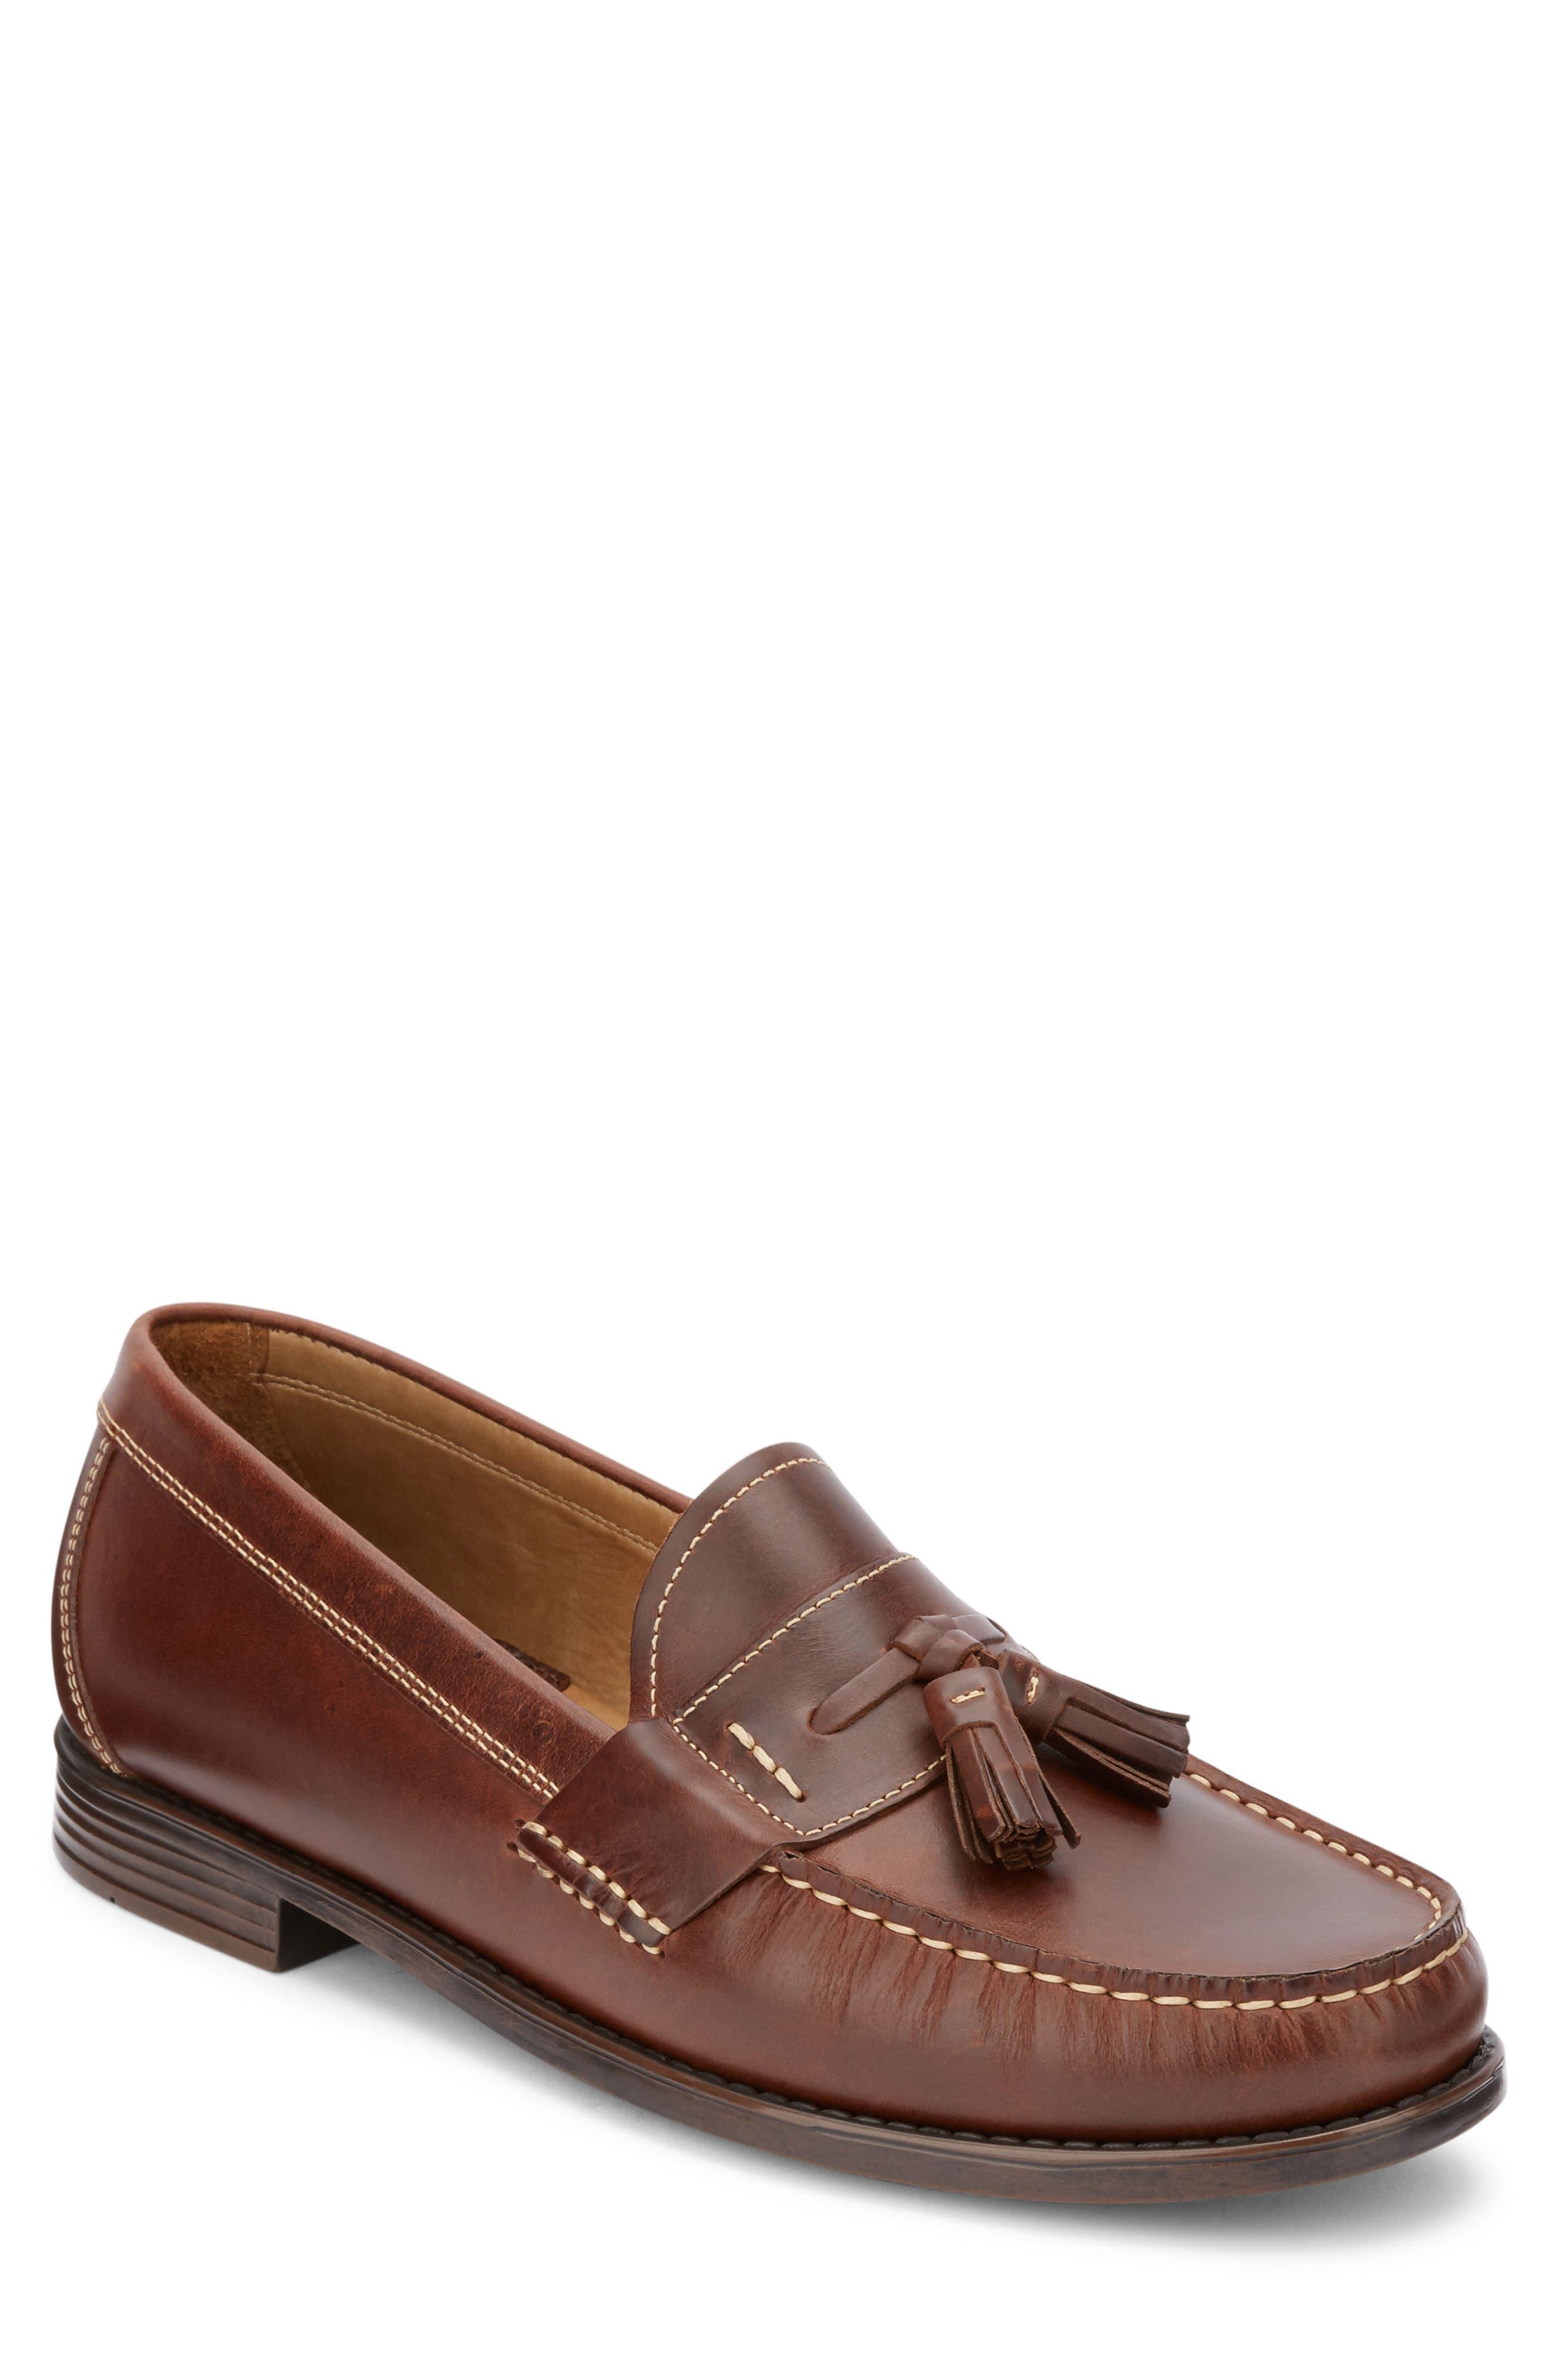 c83e26f1cf3 G.H. Bass   Co. shoes